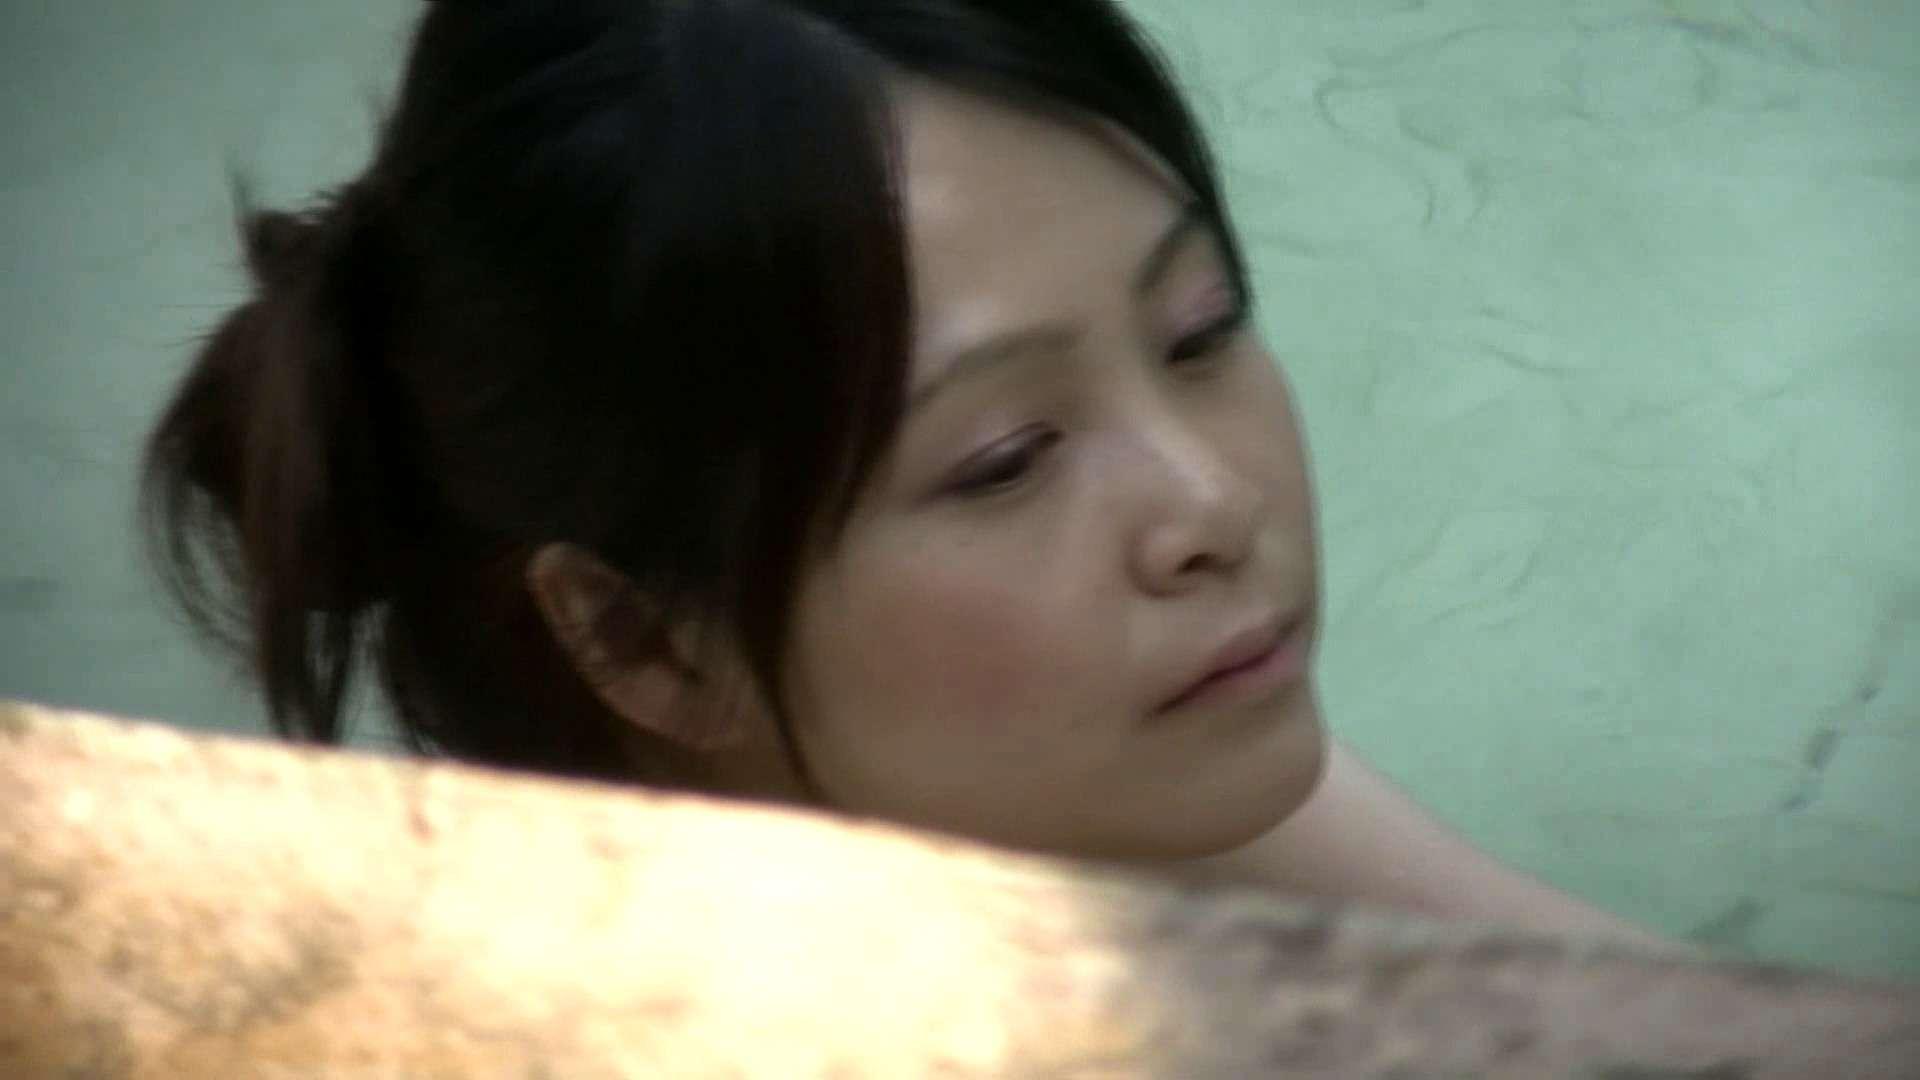 Aquaな露天風呂Vol.652 0  41連発 4